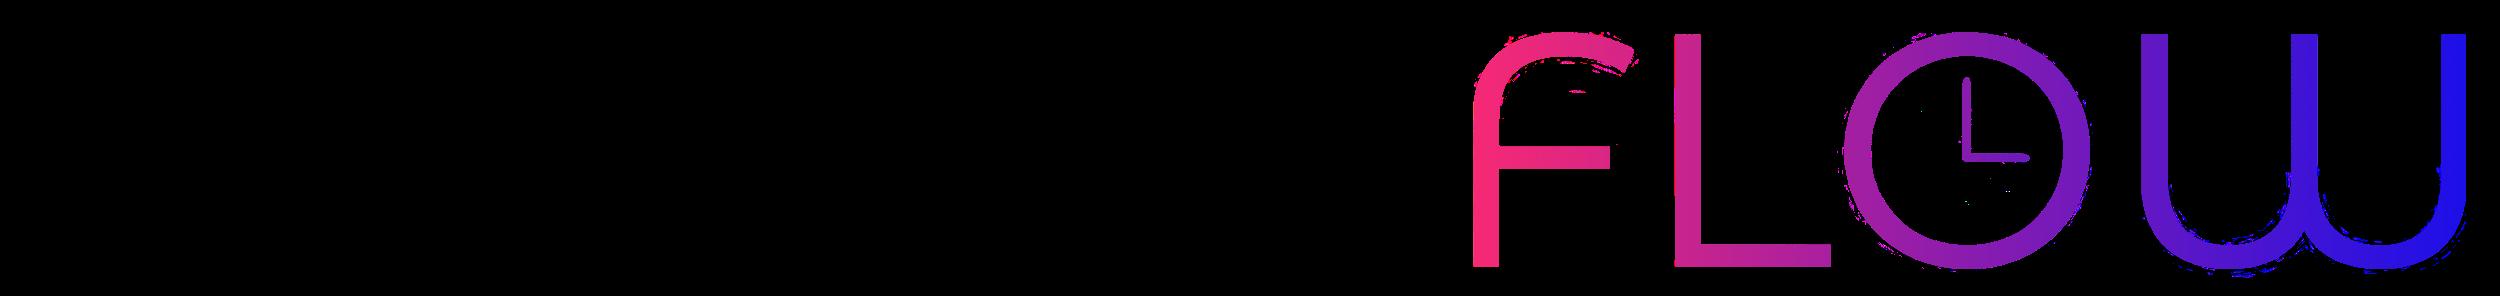 SpeakerFlow logo